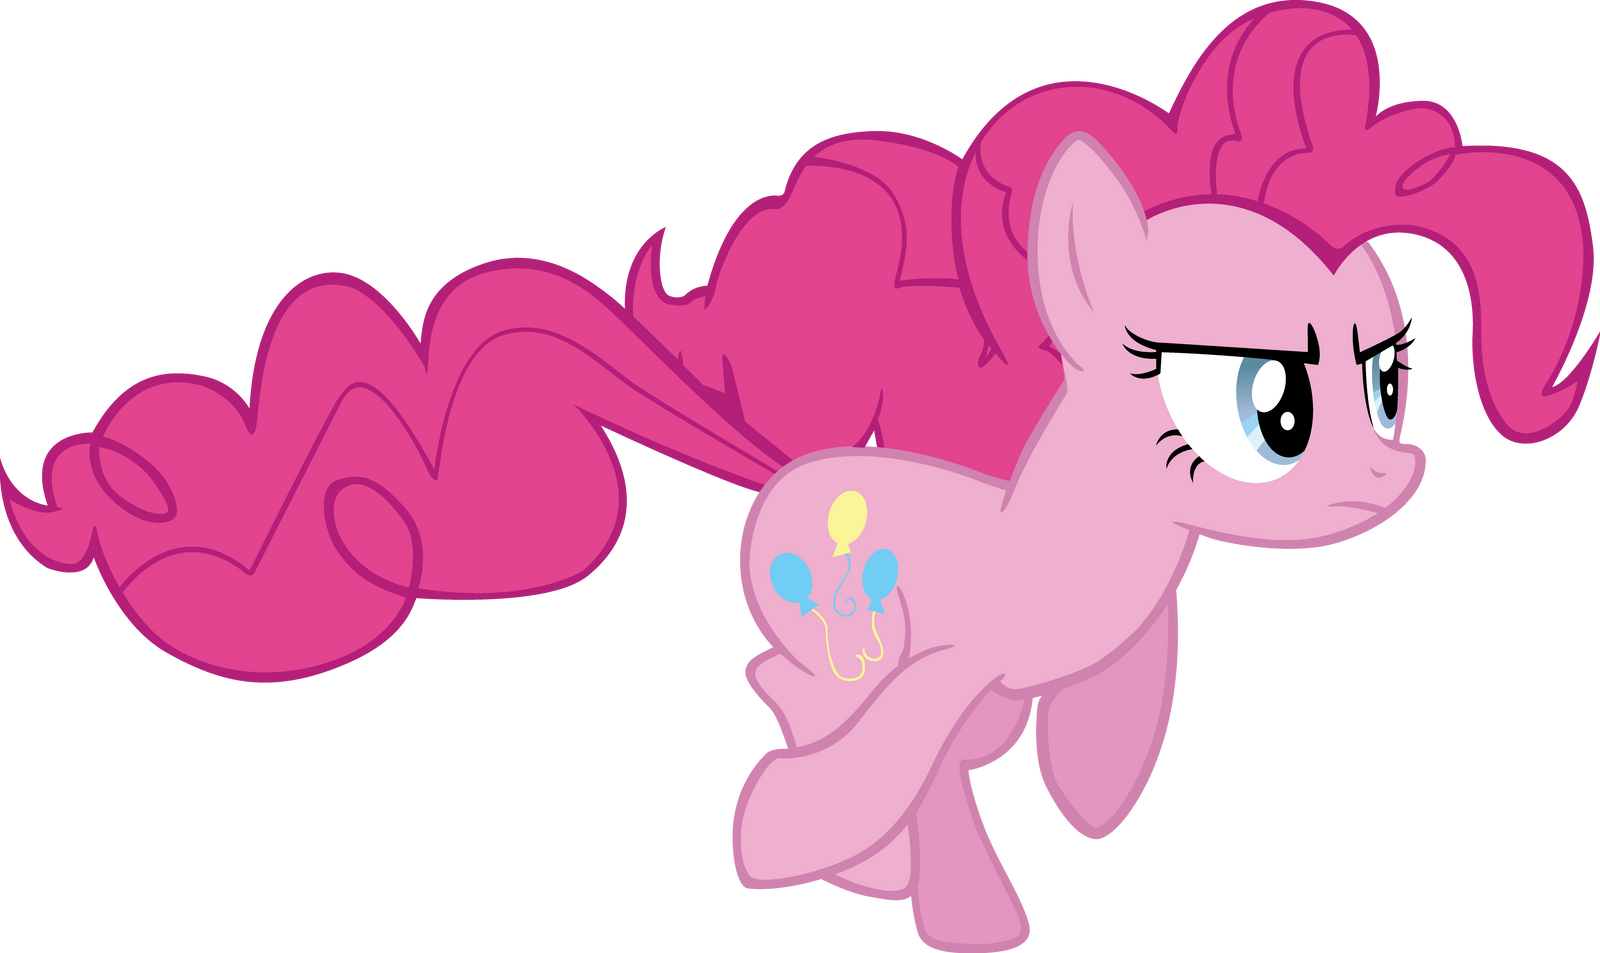 Pinkie Pie being Pinkie Pie by Ocarina0fTimelord